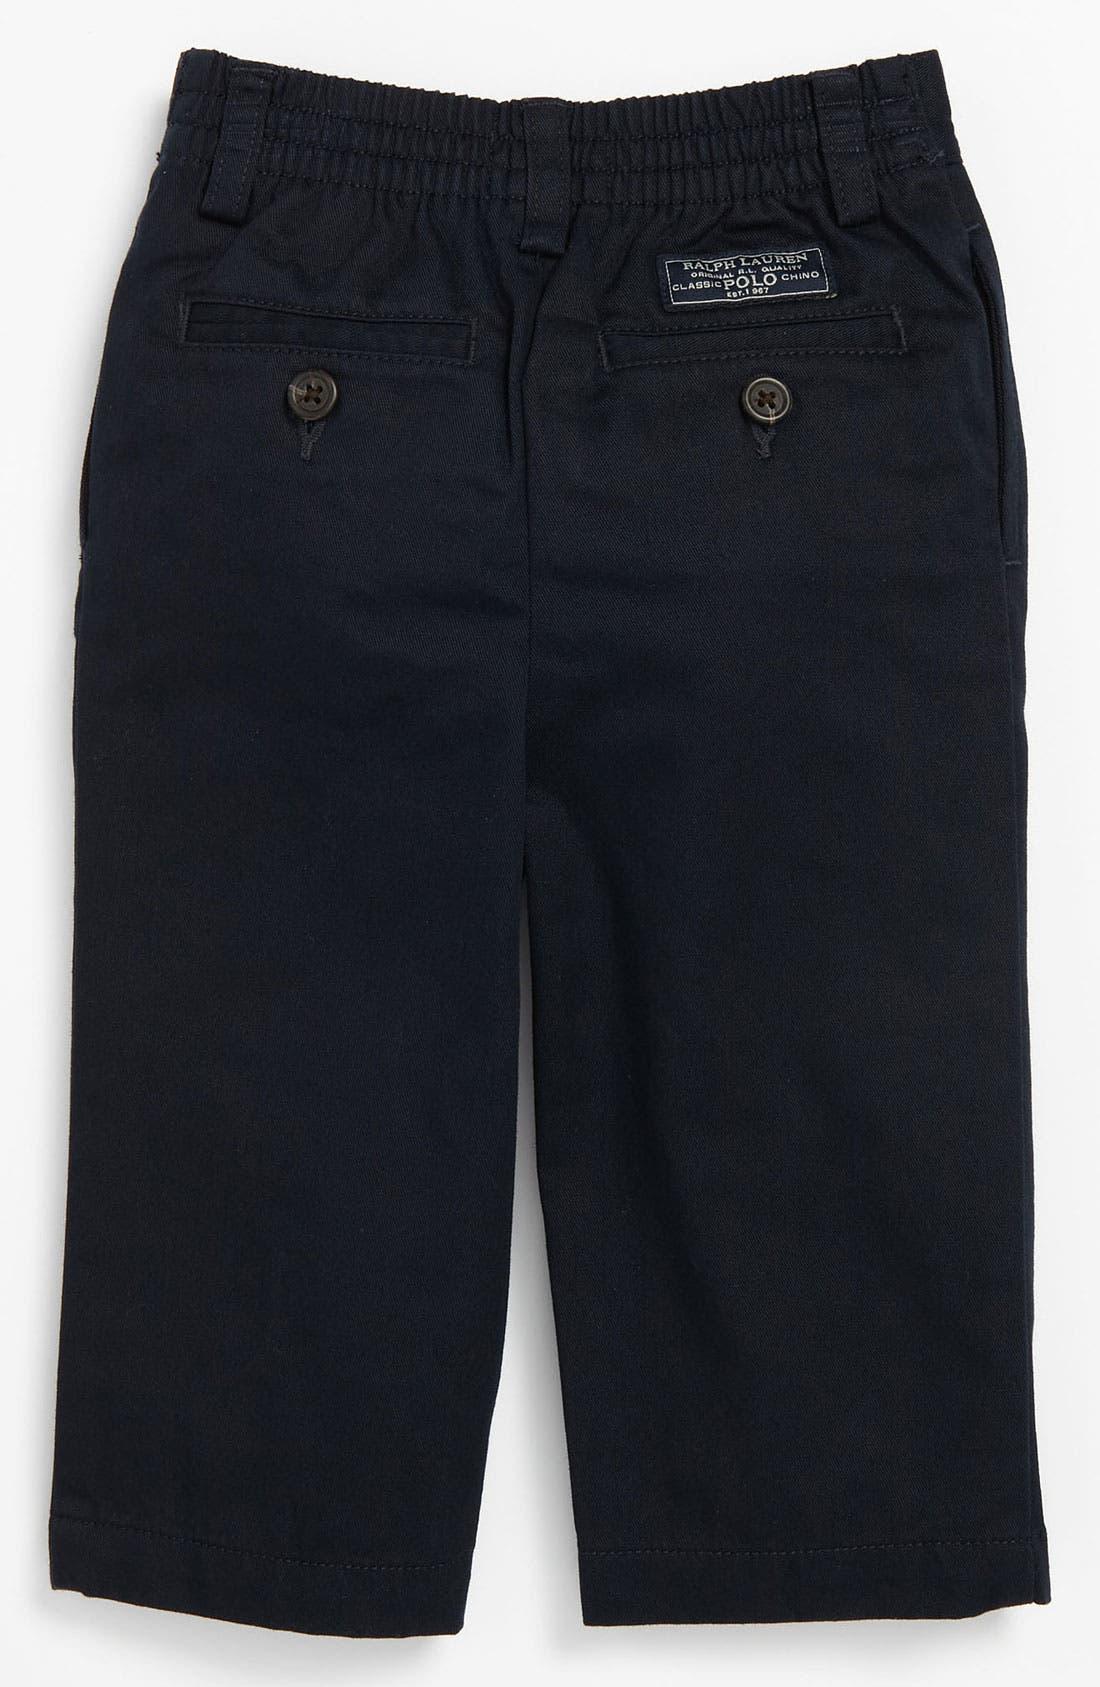 Alternate Image 1 Selected - Ralph Lauren Pleated Pants (Baby)